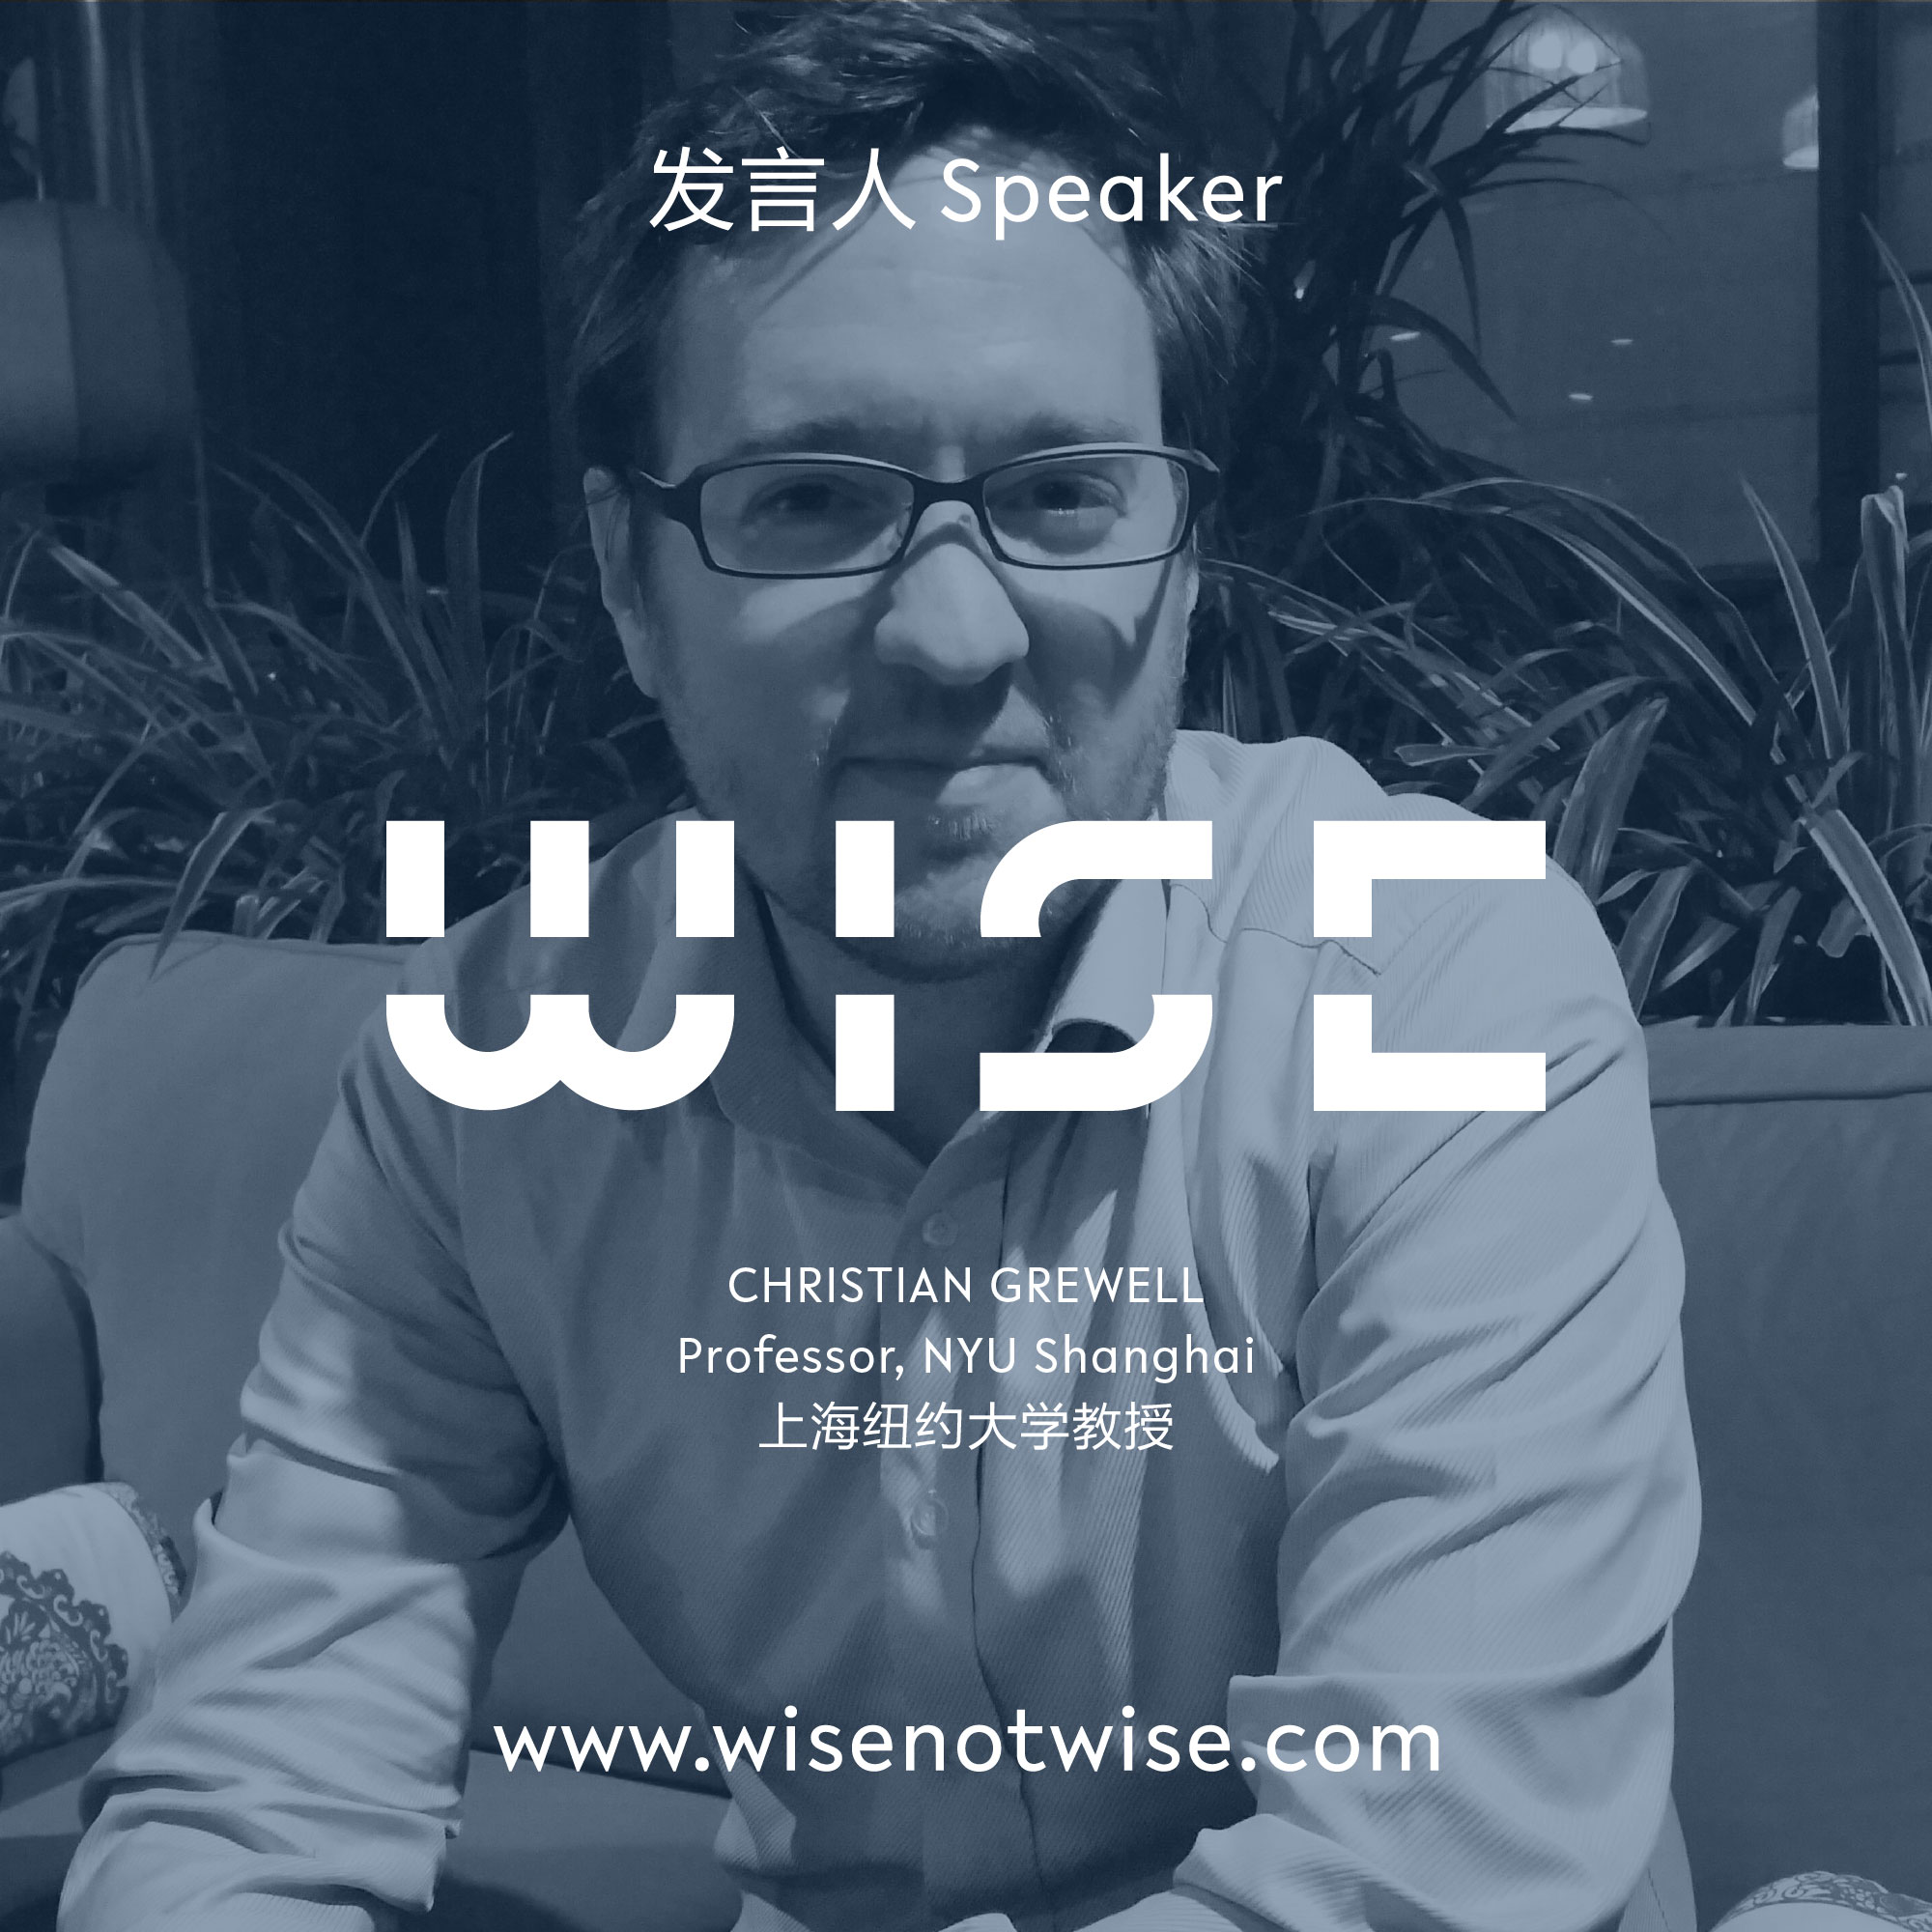 Christian Grewell (Professor at NYU Shanghai)